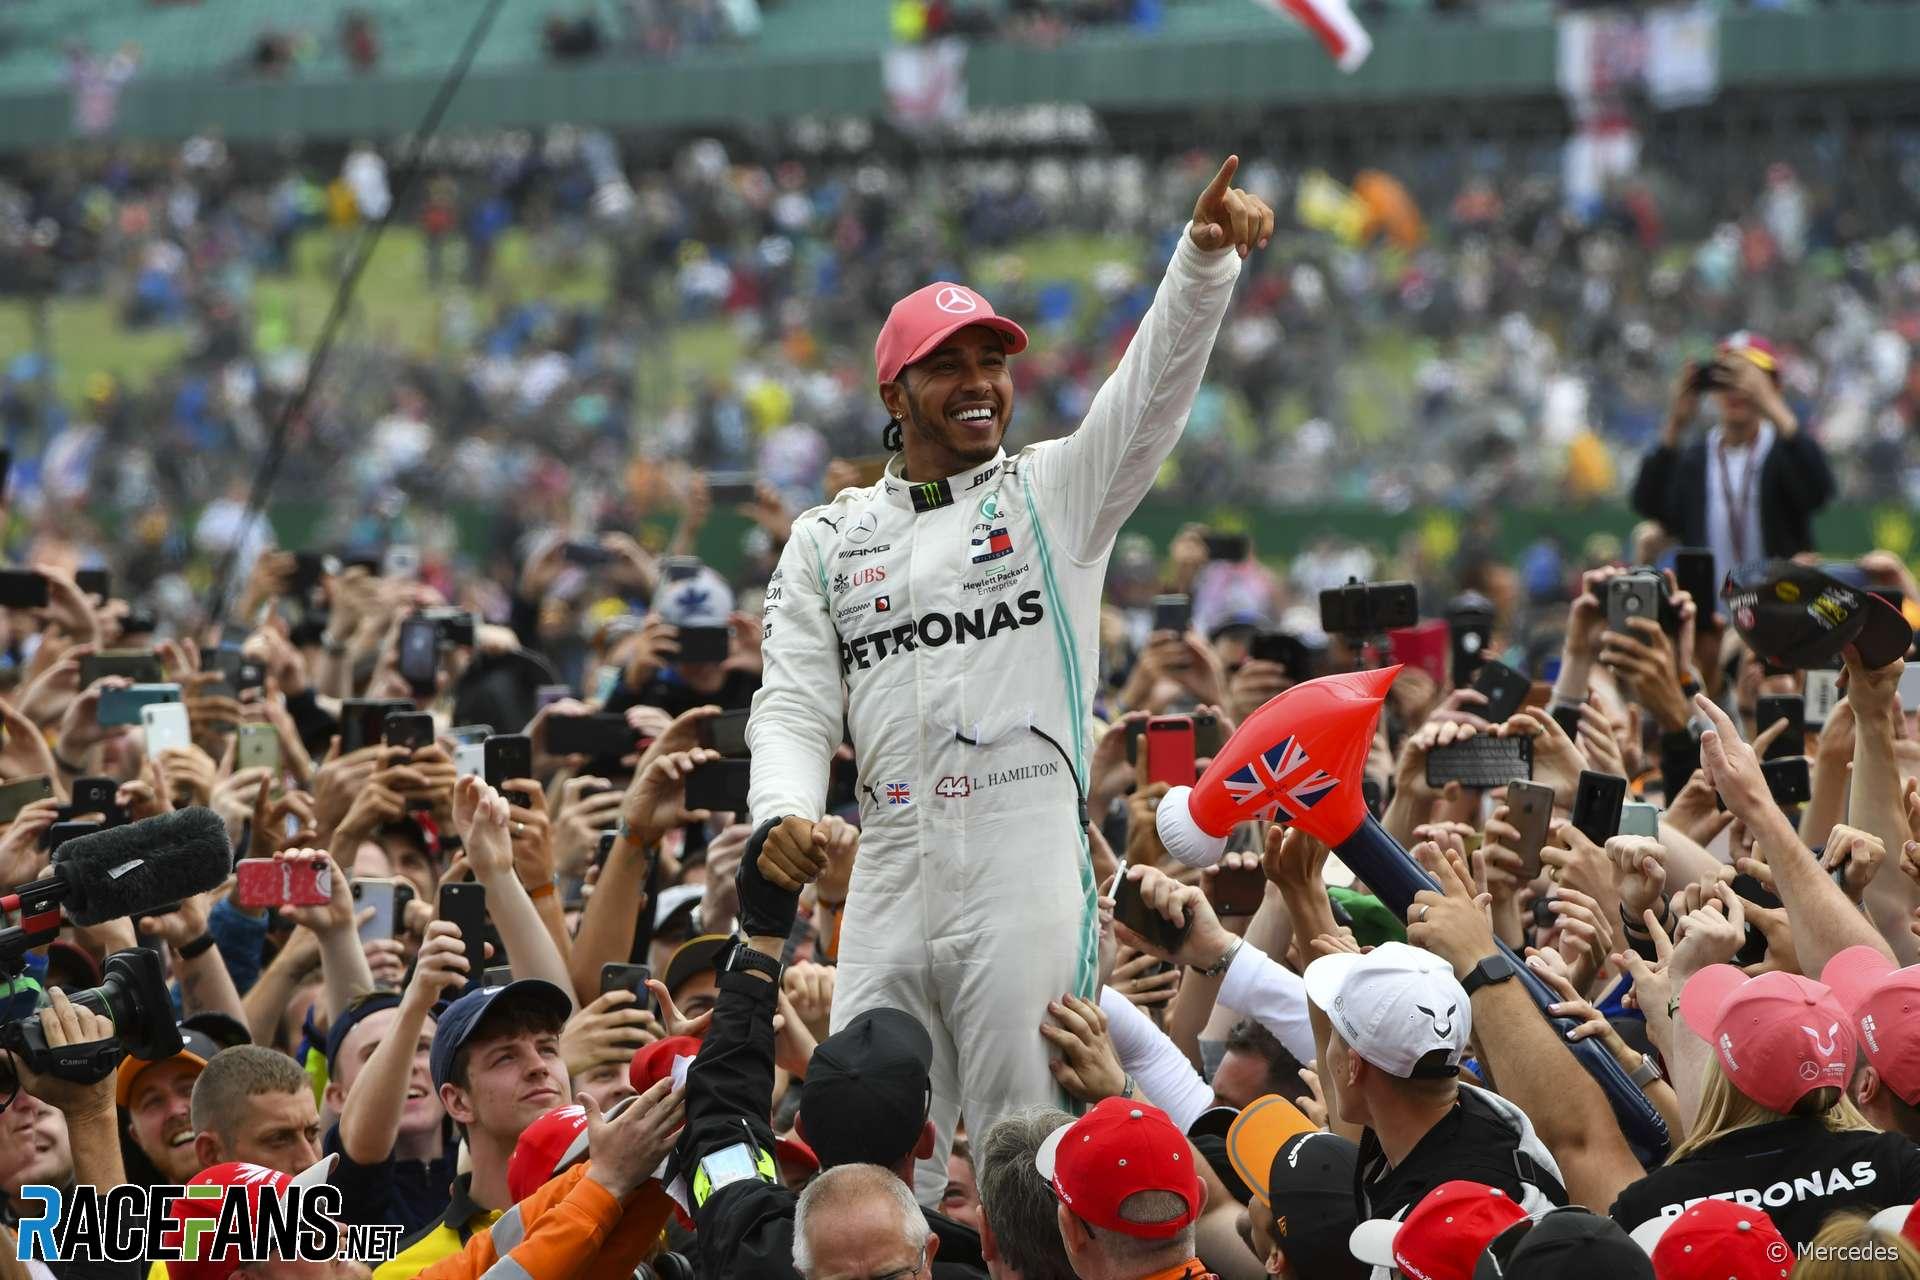 Lewis Hamilton aims to get a